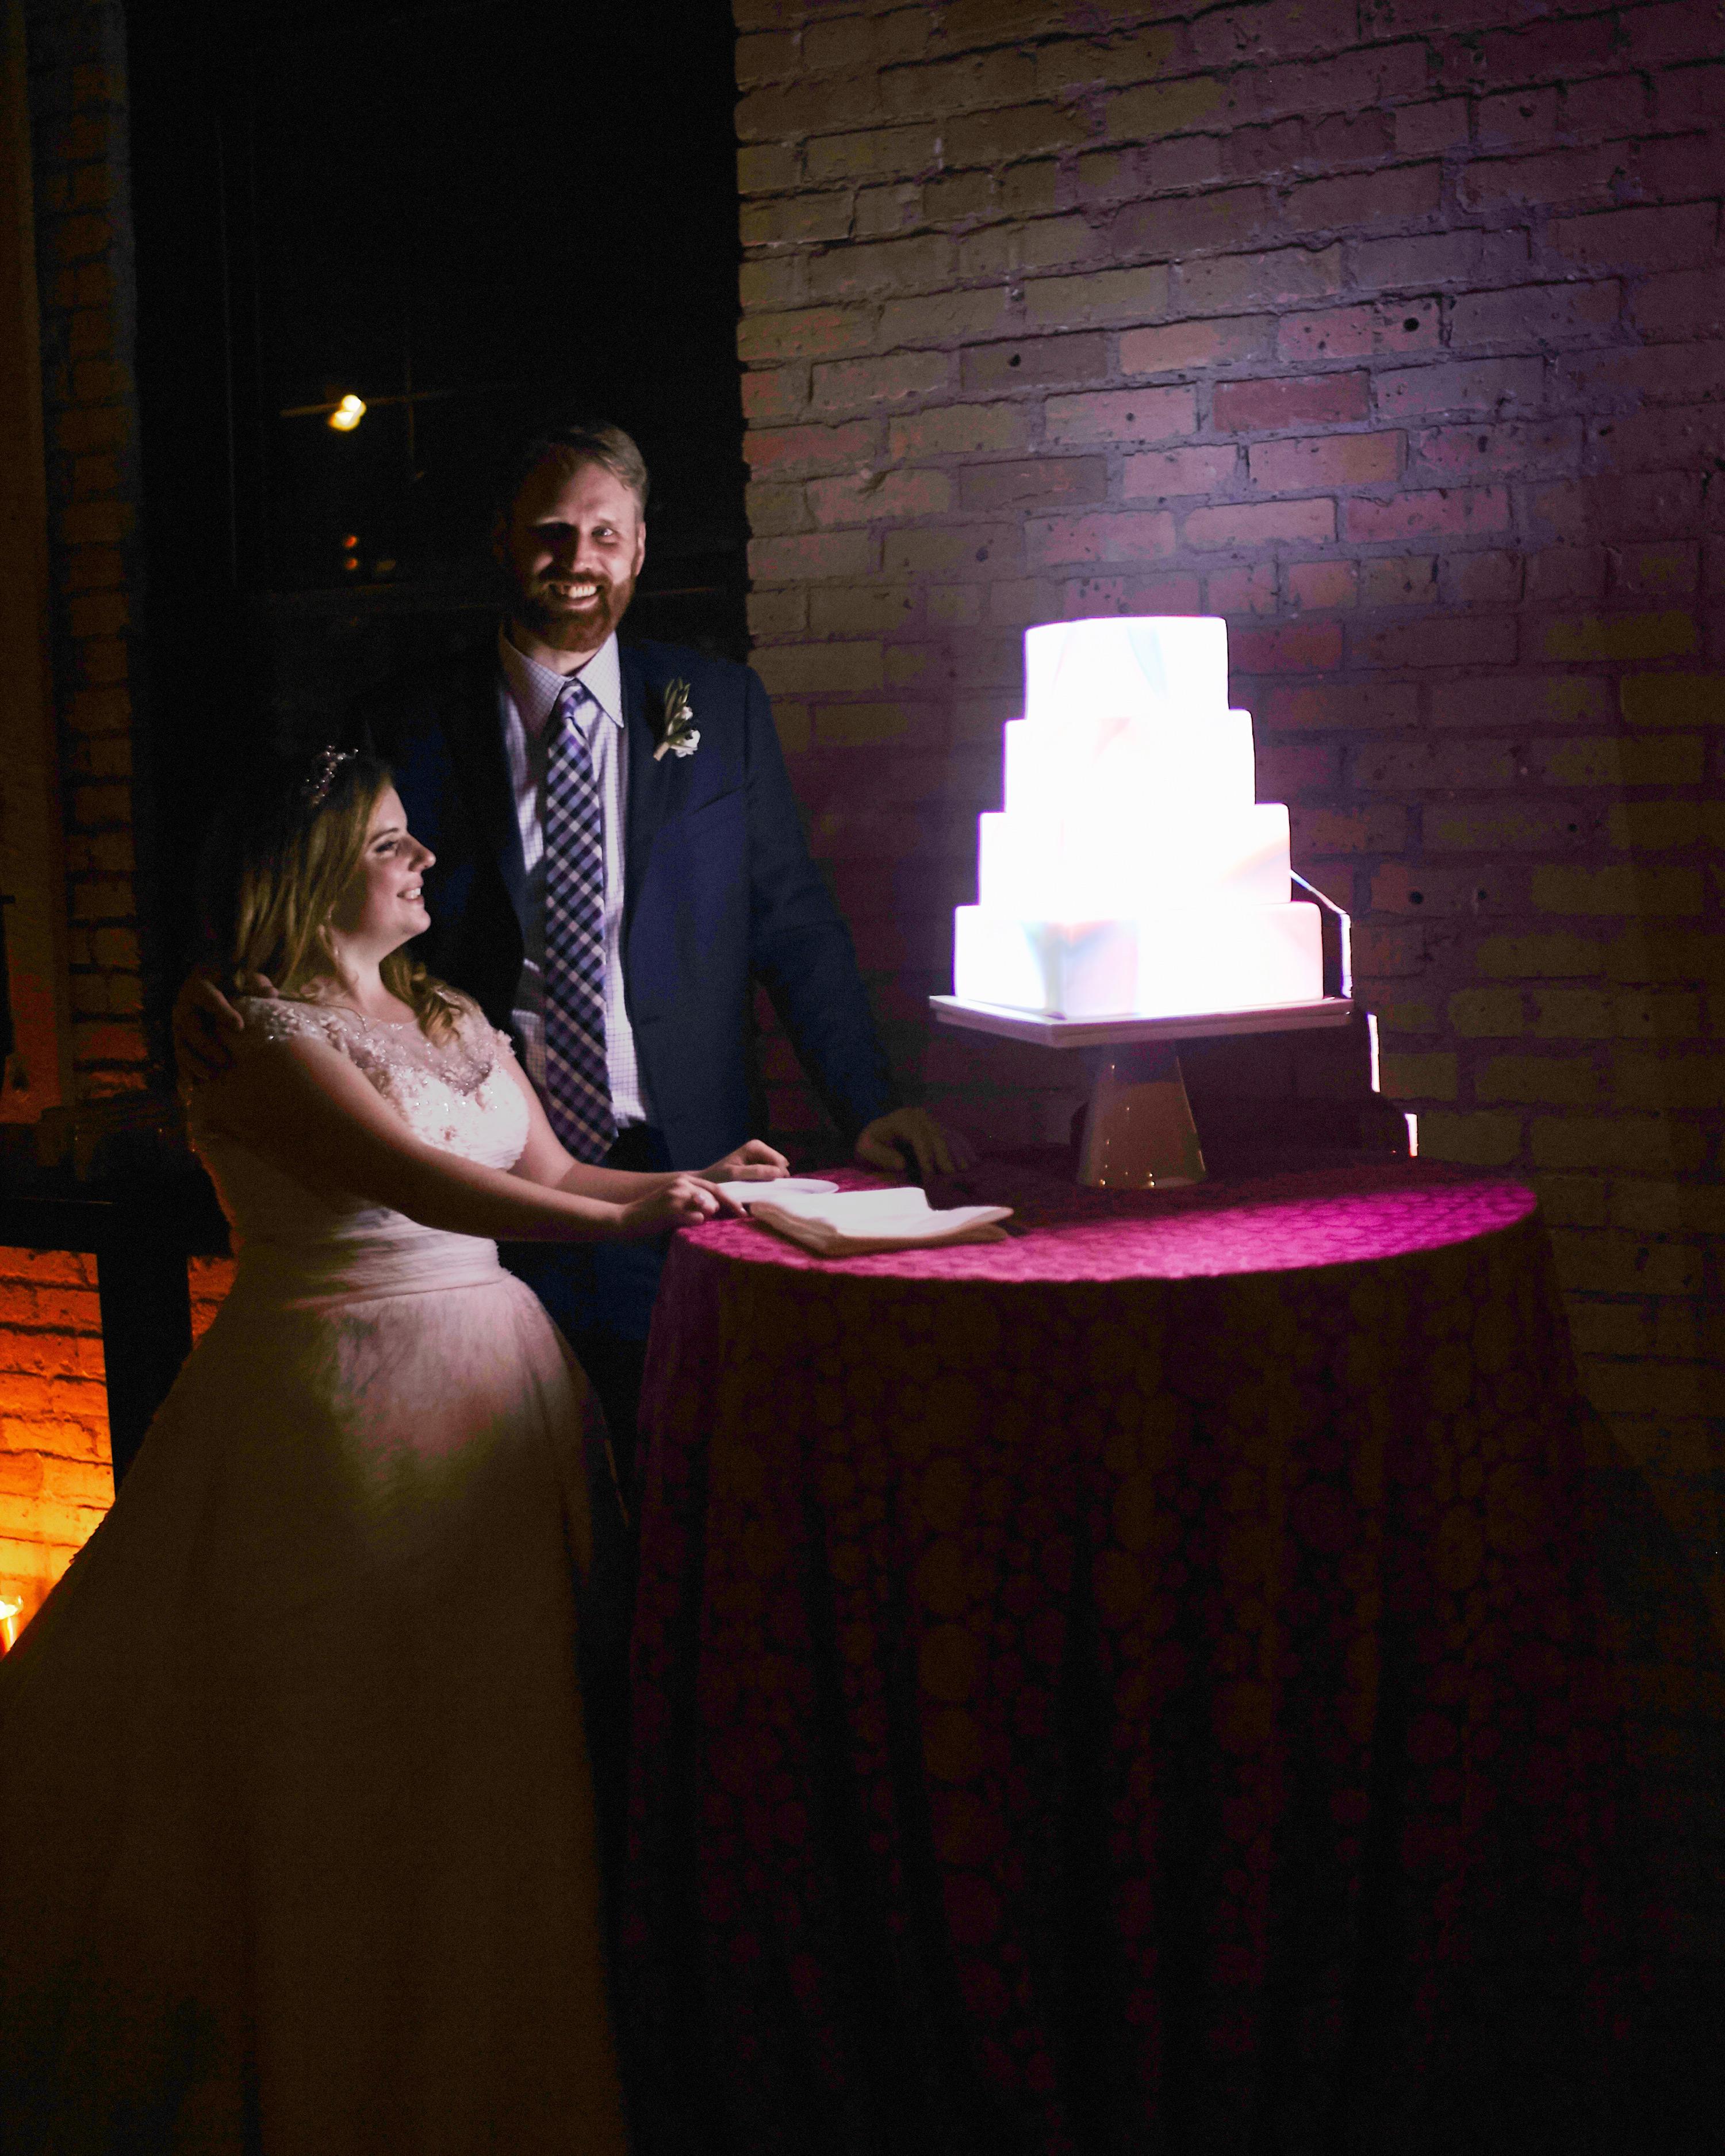 maddy-mike-wedding-couple-893.cm2.463.2015.49-6134174-0716.jpg